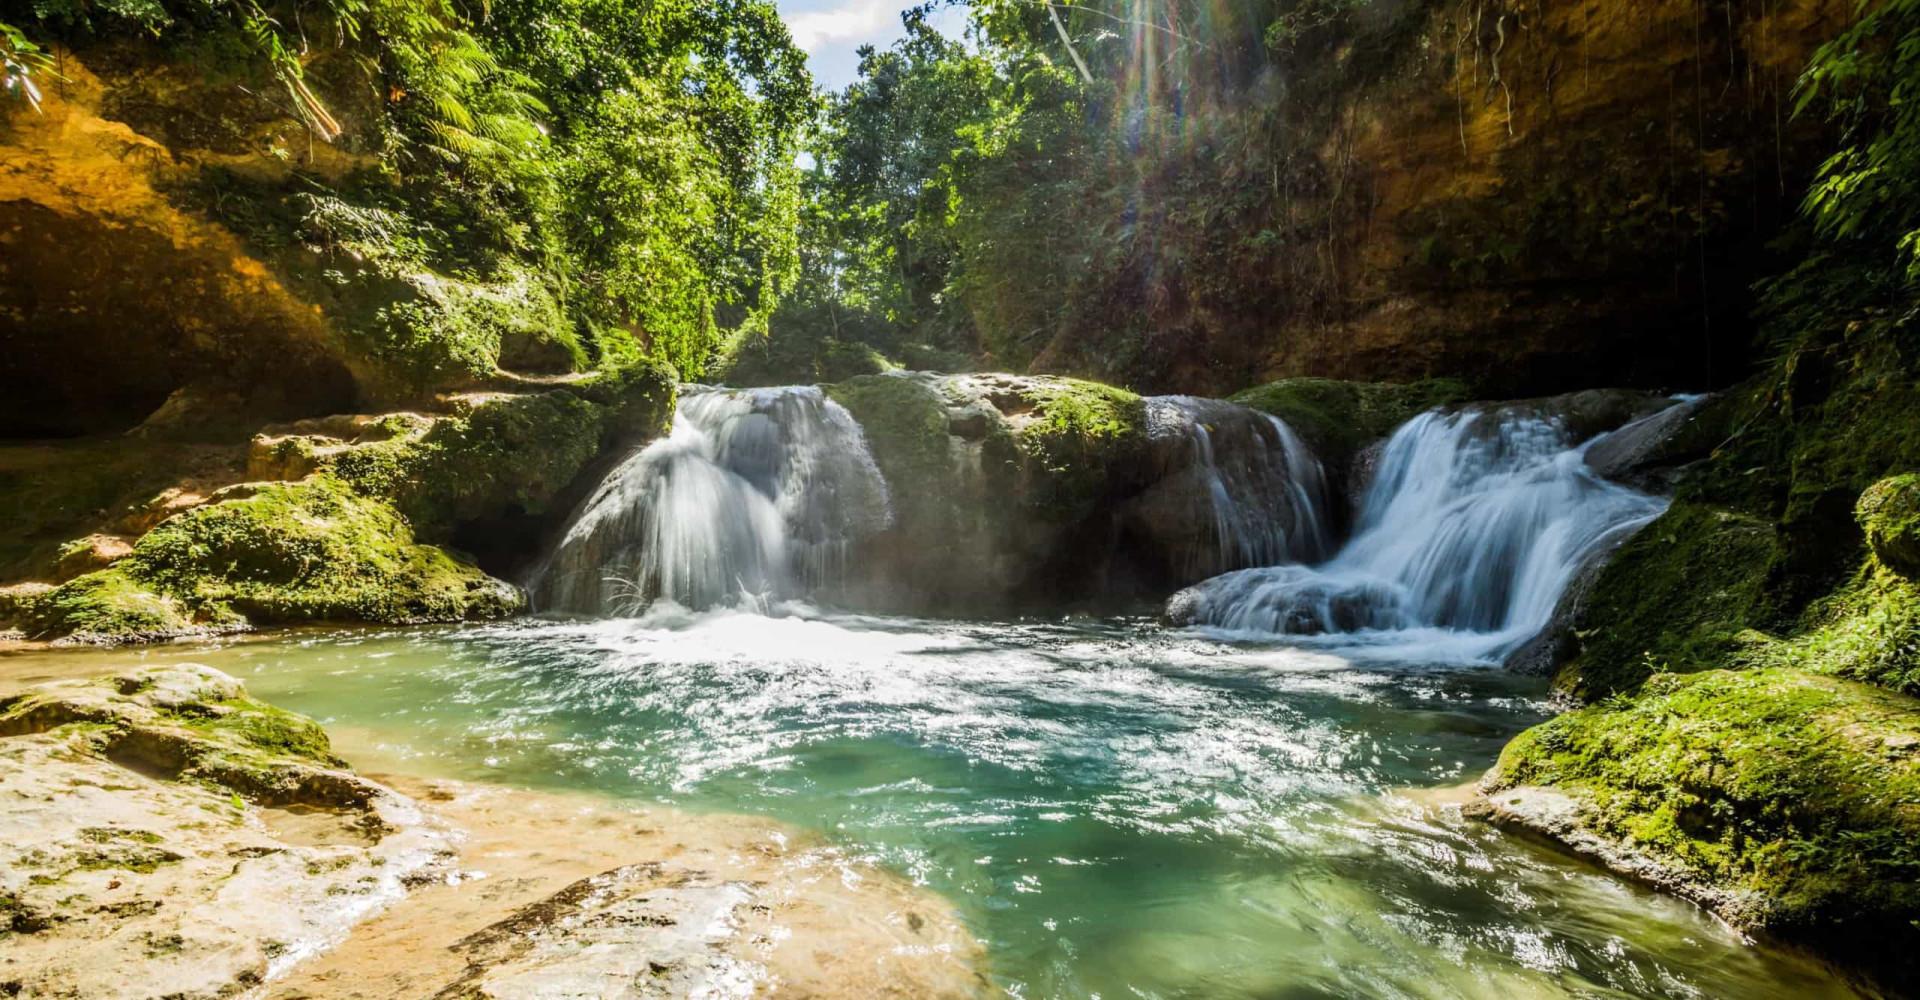 Take a dip in America's best natural pools